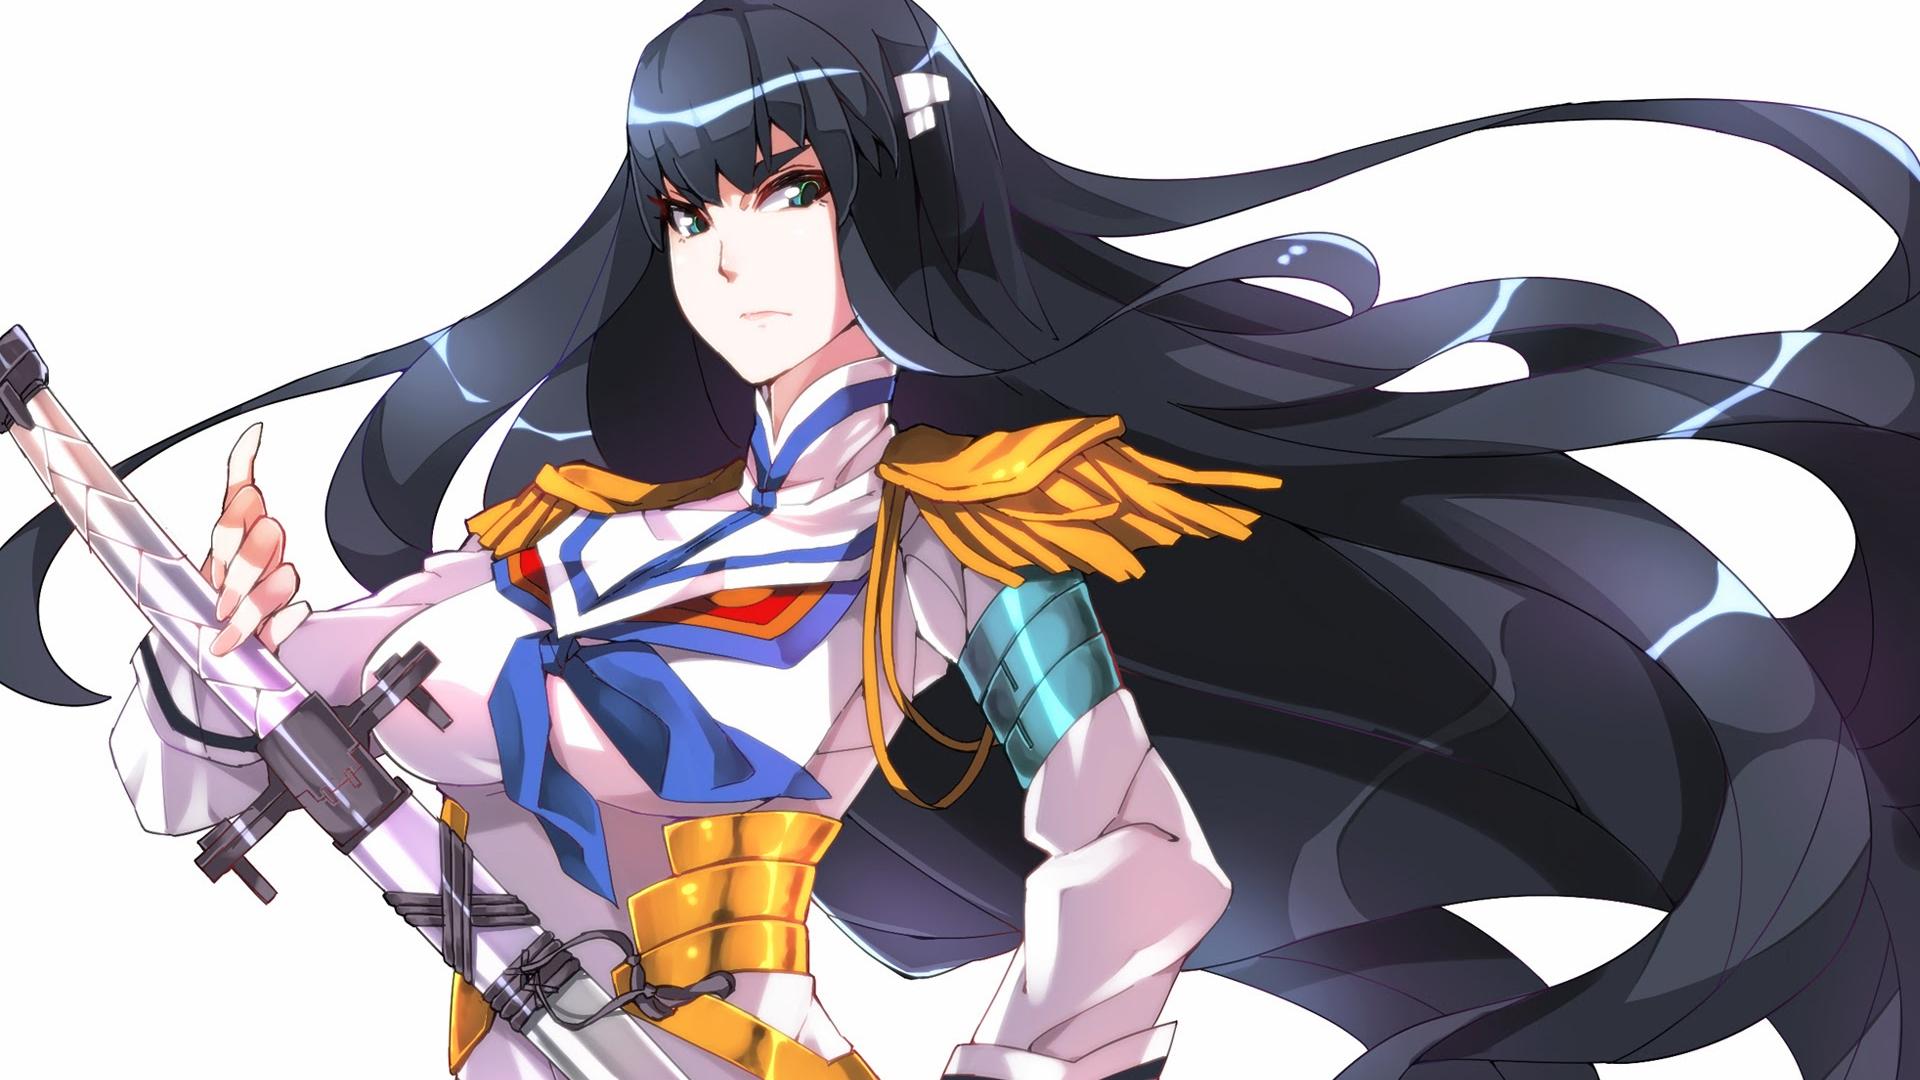 Free Download Kiryuin Satsuki Kill La Kill Anime Girl Image Hd